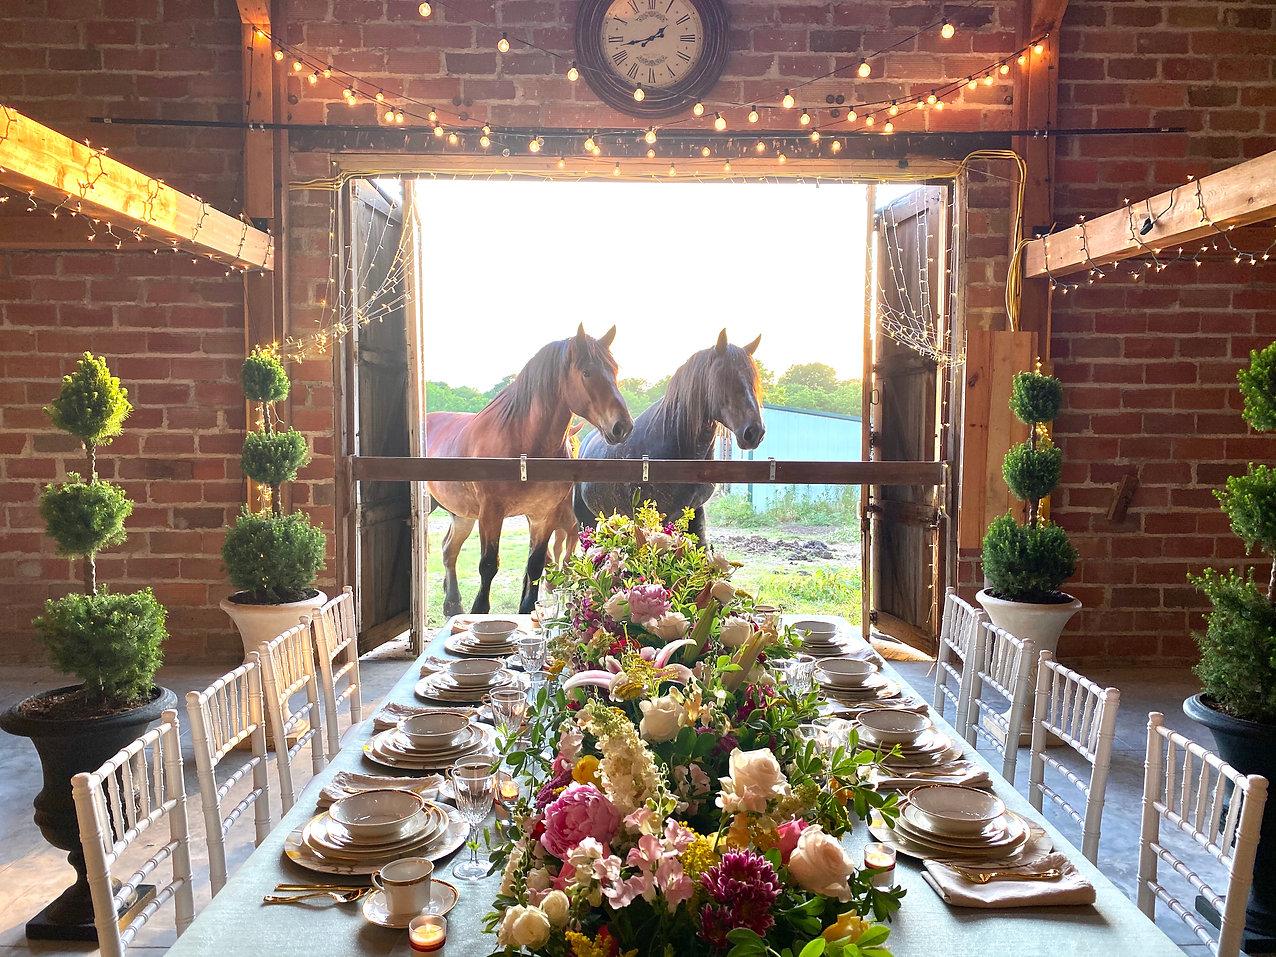 KnobHillBarn Historic Venue Draft Horse farm.jpg